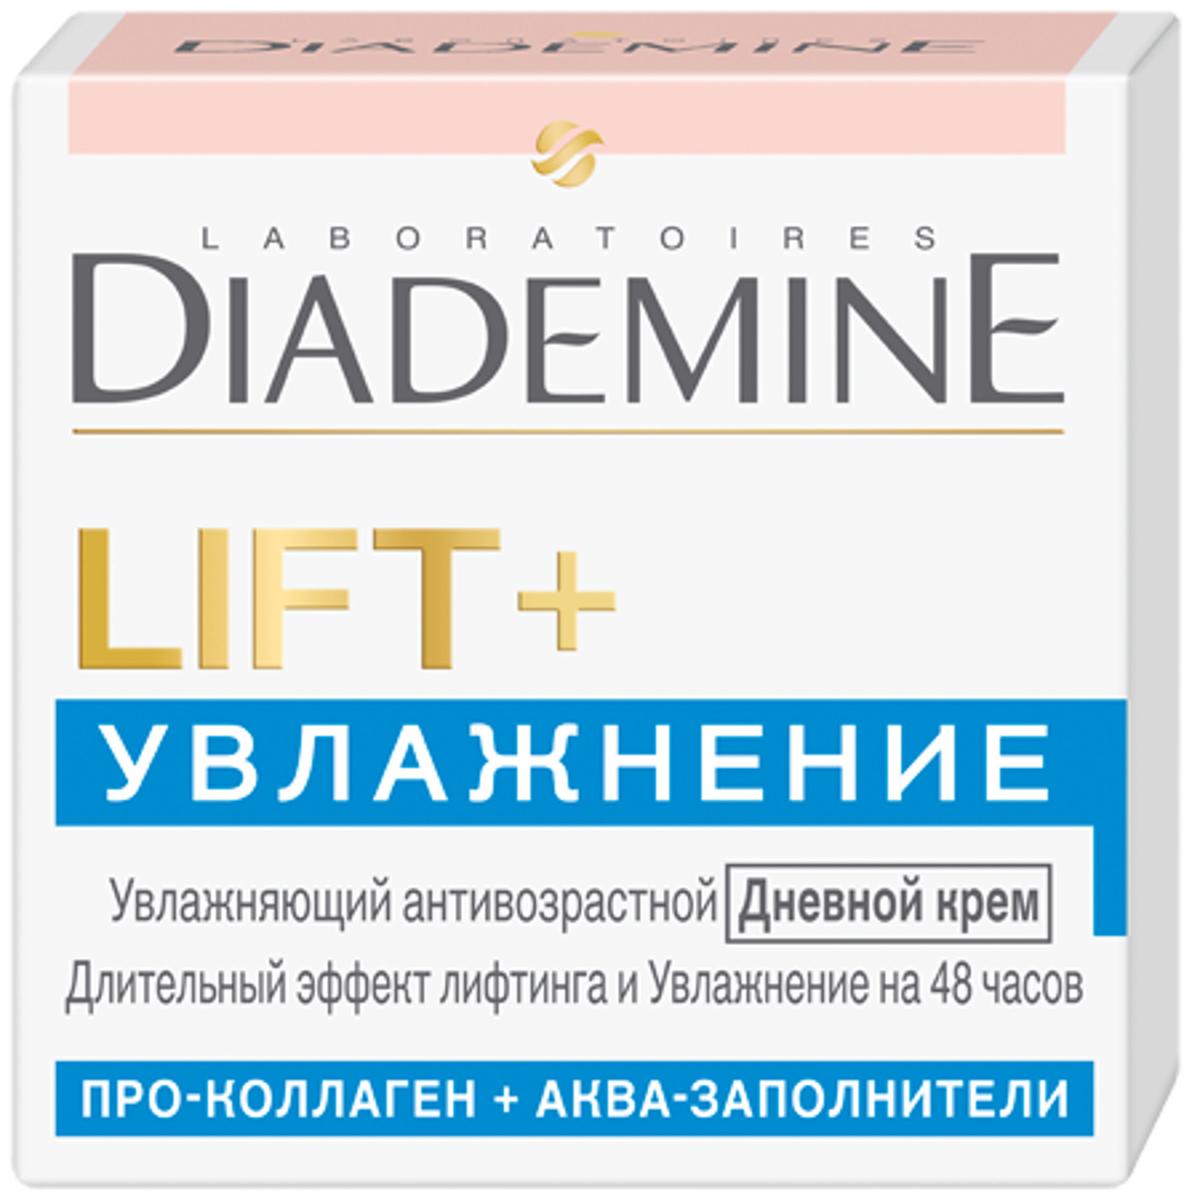 DIADEMINE LIFT+Дневной крем Увлажнение, 50мл Diademine